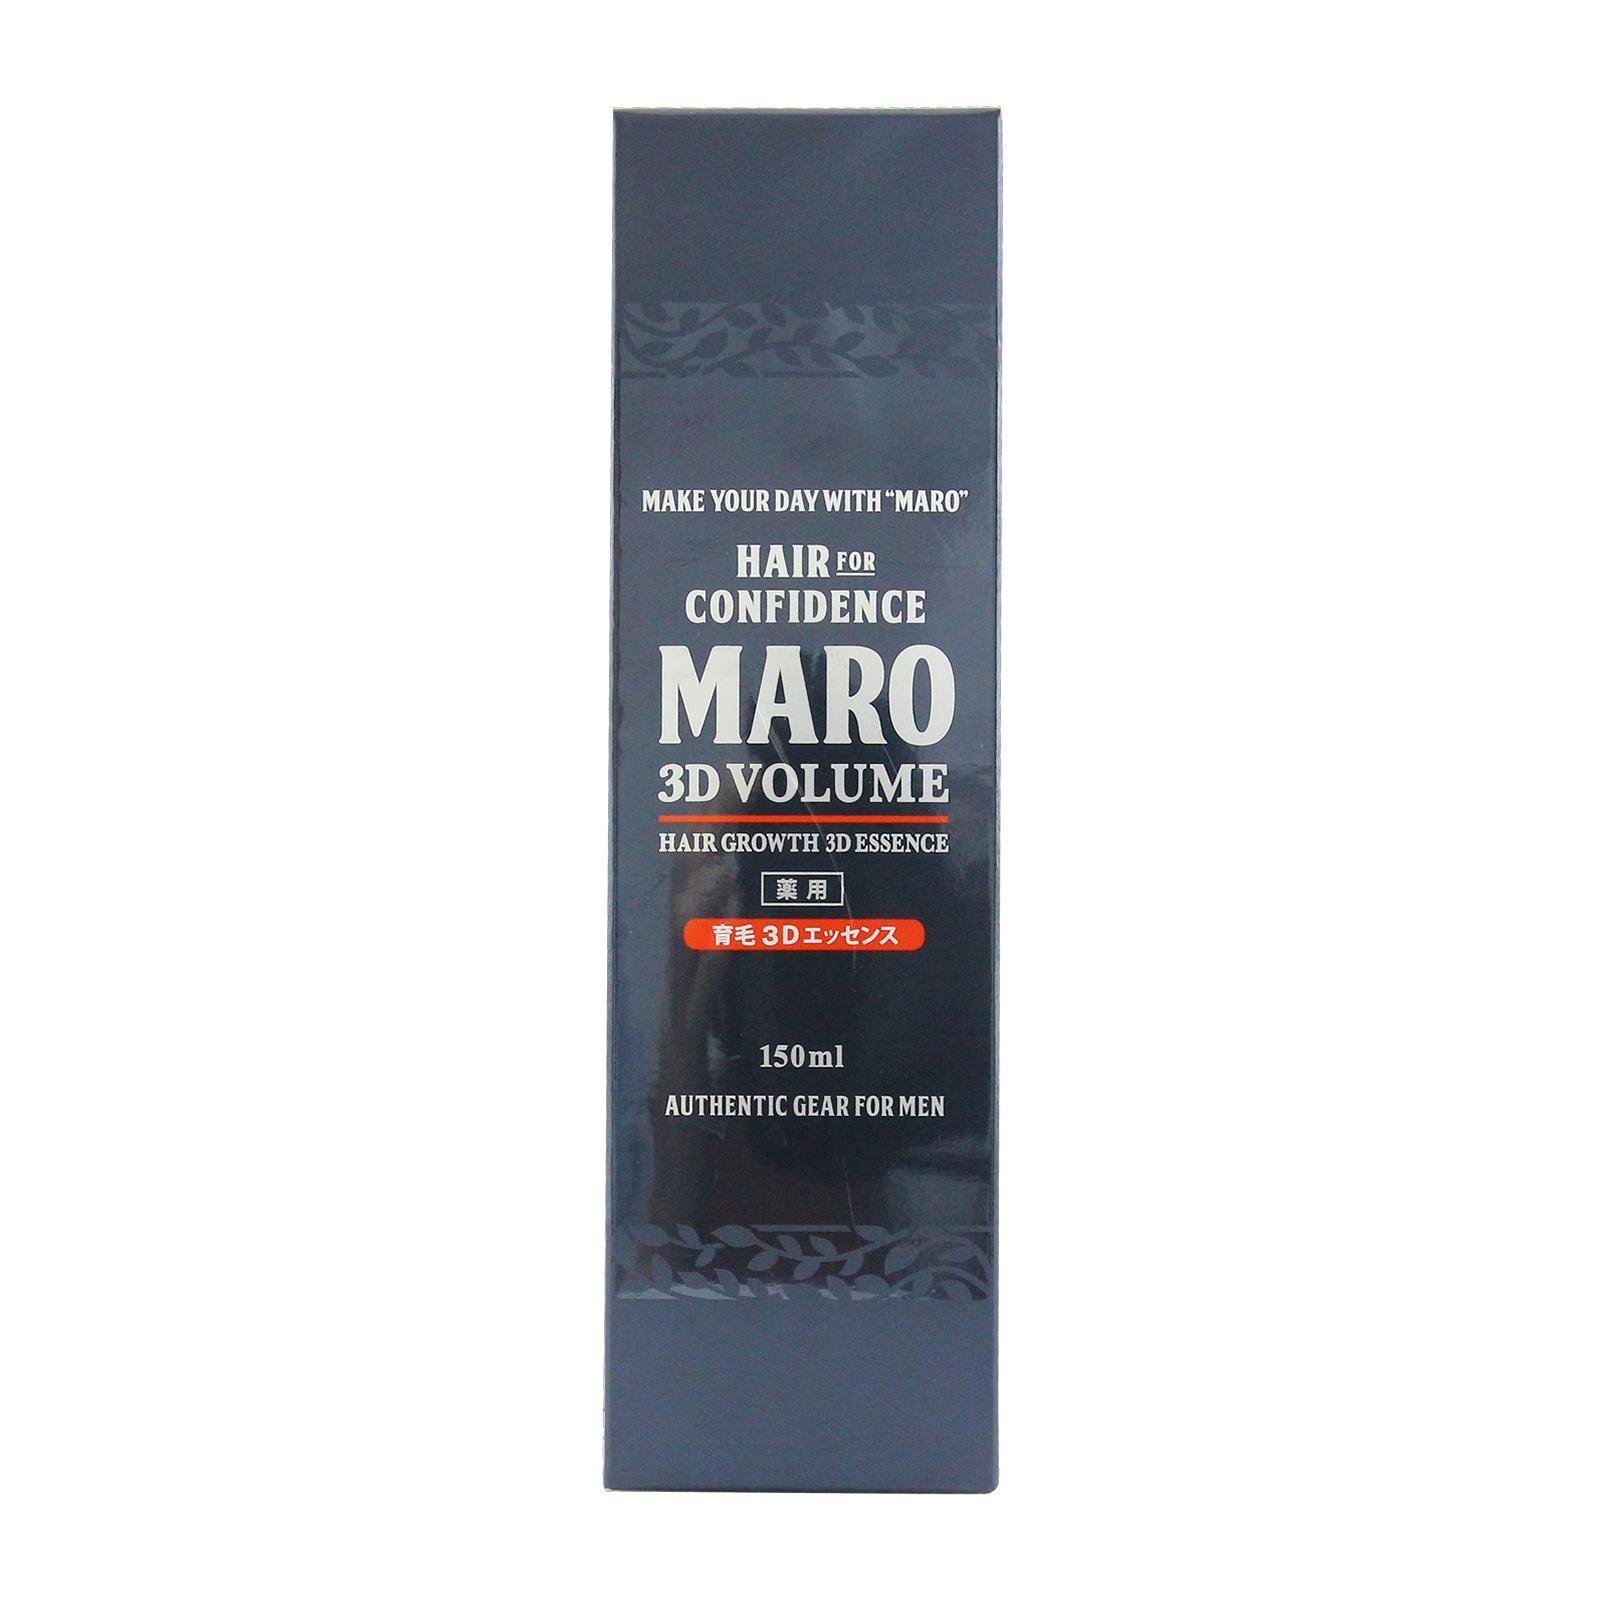 Maro 3D Volume Hair Growth 3D Essence